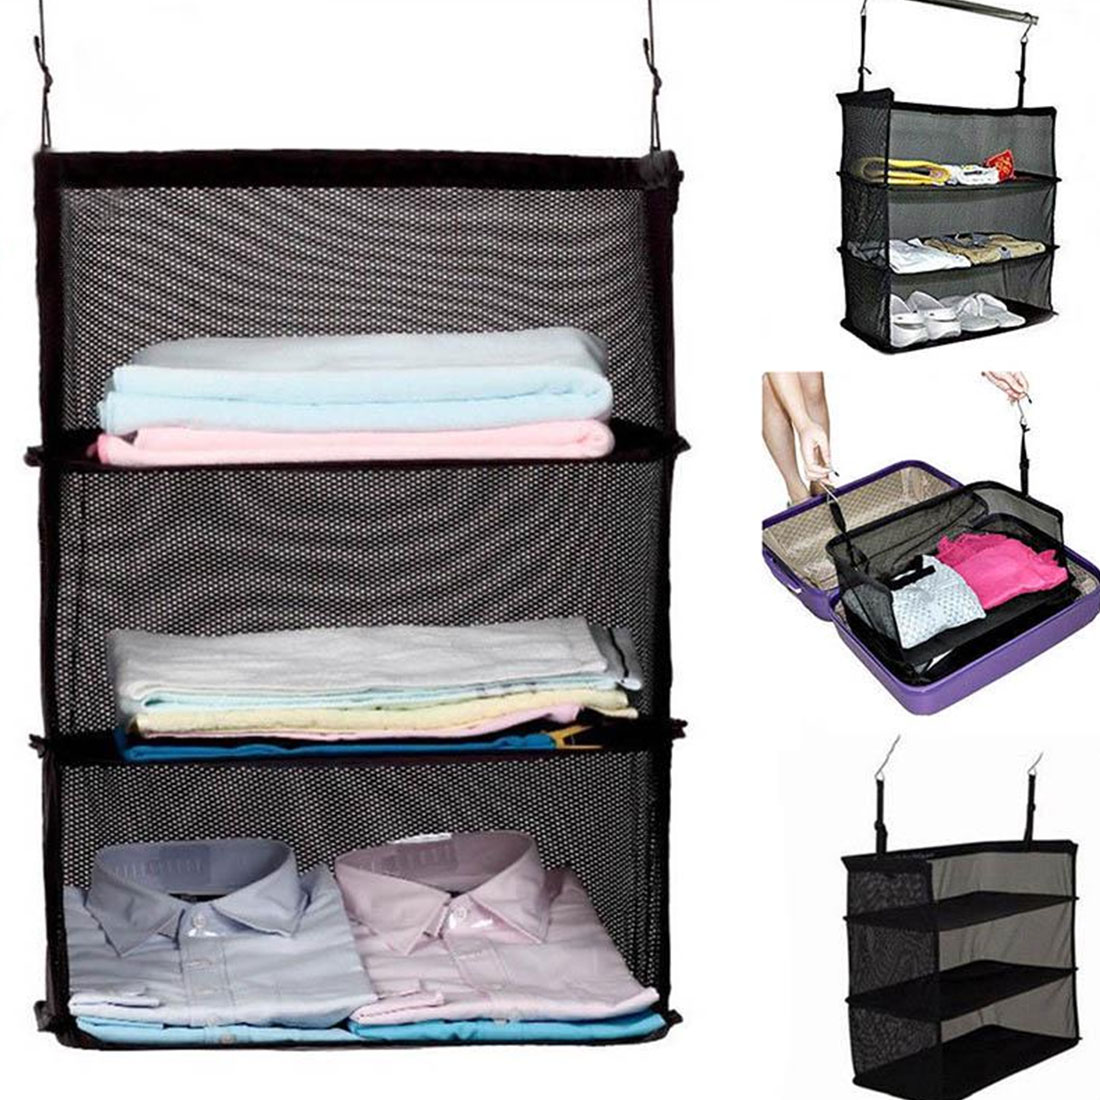 Black 3 Layers Travel Wardrobe Bag Suitcase Shelves Trave Storage Bag Storage Bag Hanging Hooks